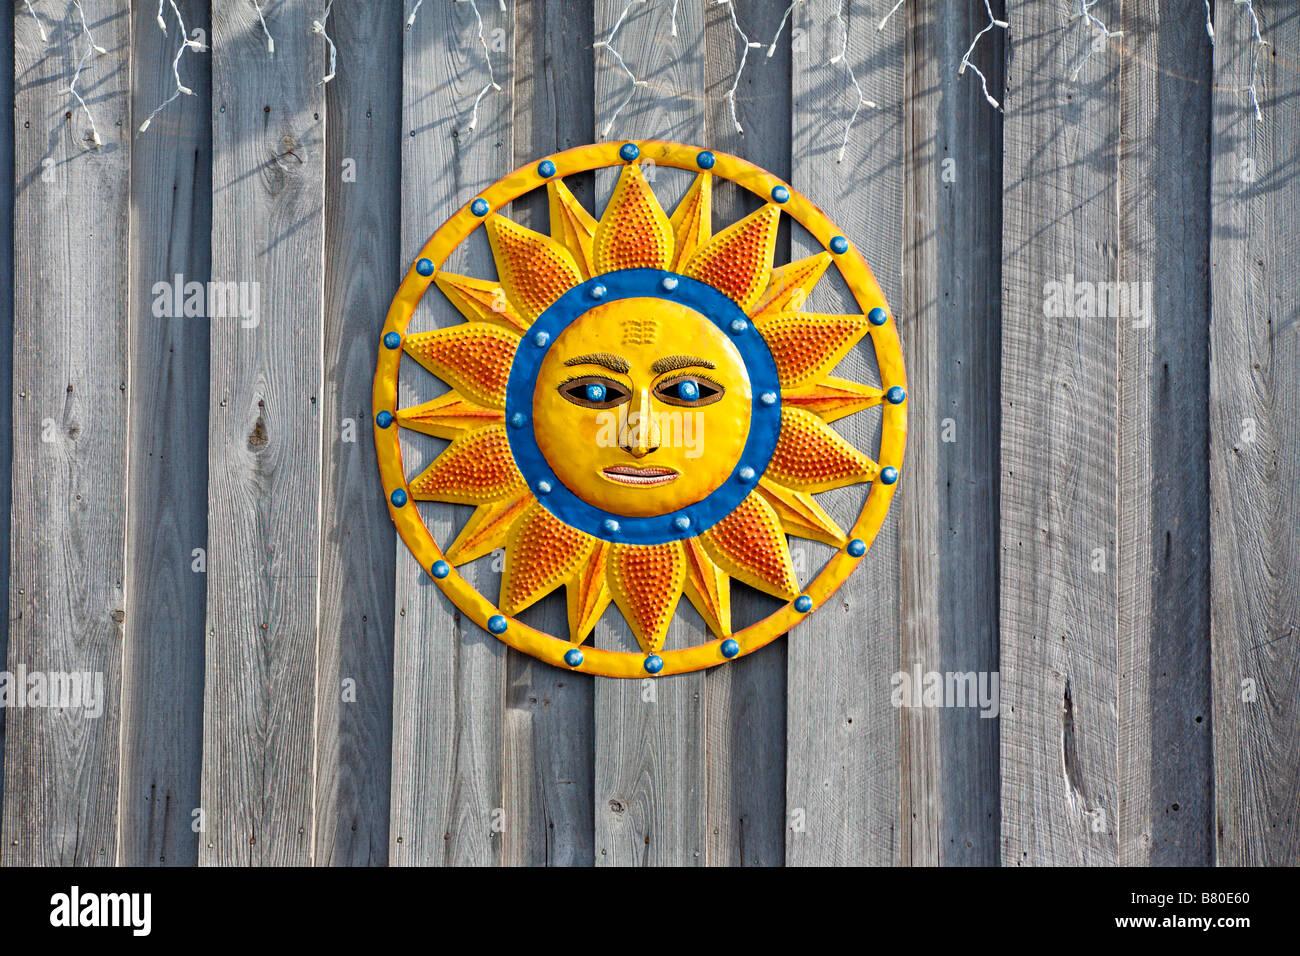 Tourism Wall Hanging Wood Stock Photos & Tourism Wall Hanging Wood ...